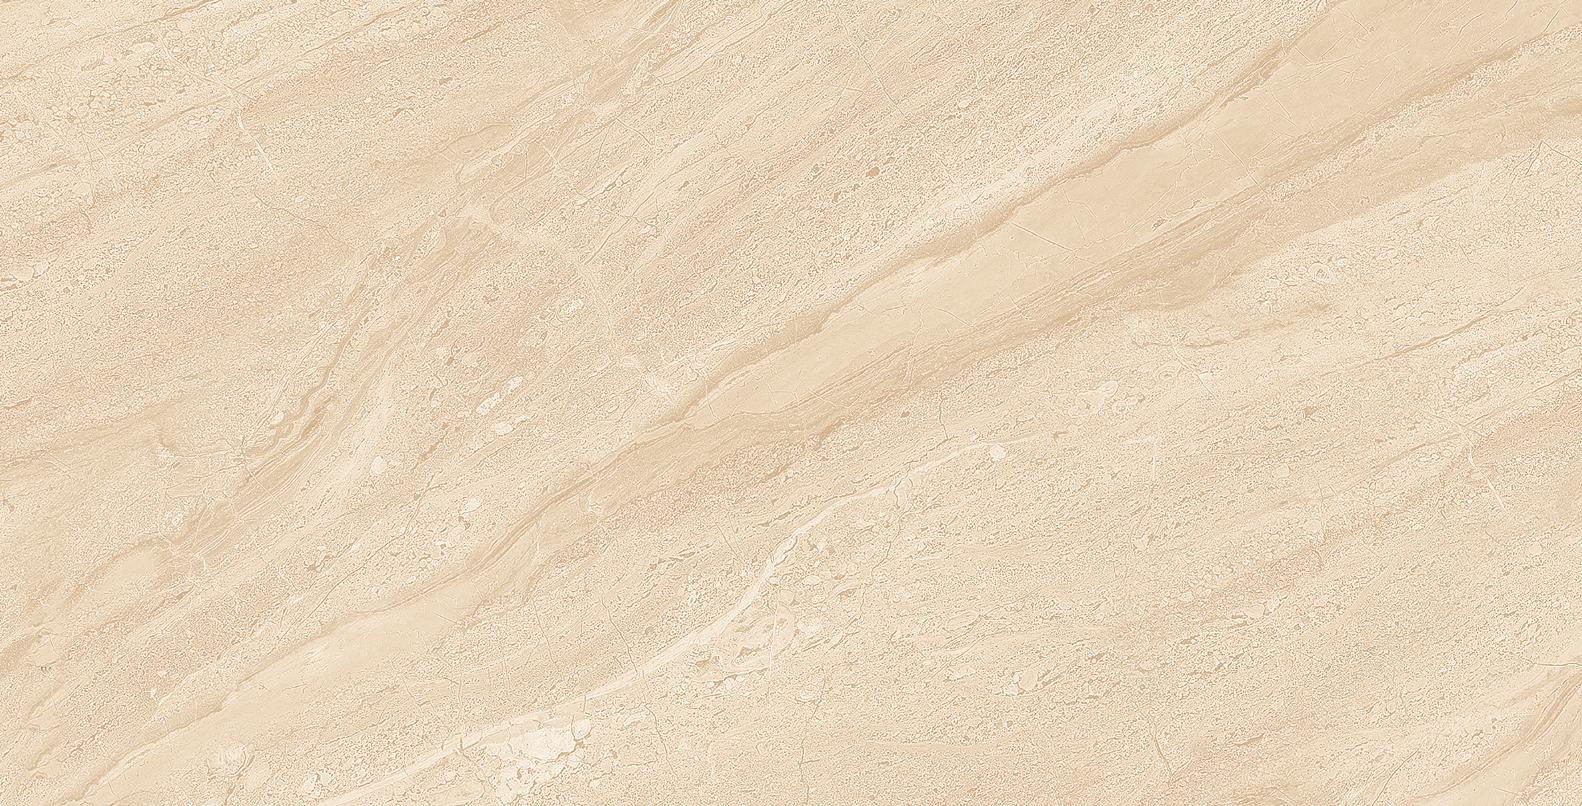 Gạch ốp tường Viglacera B3604